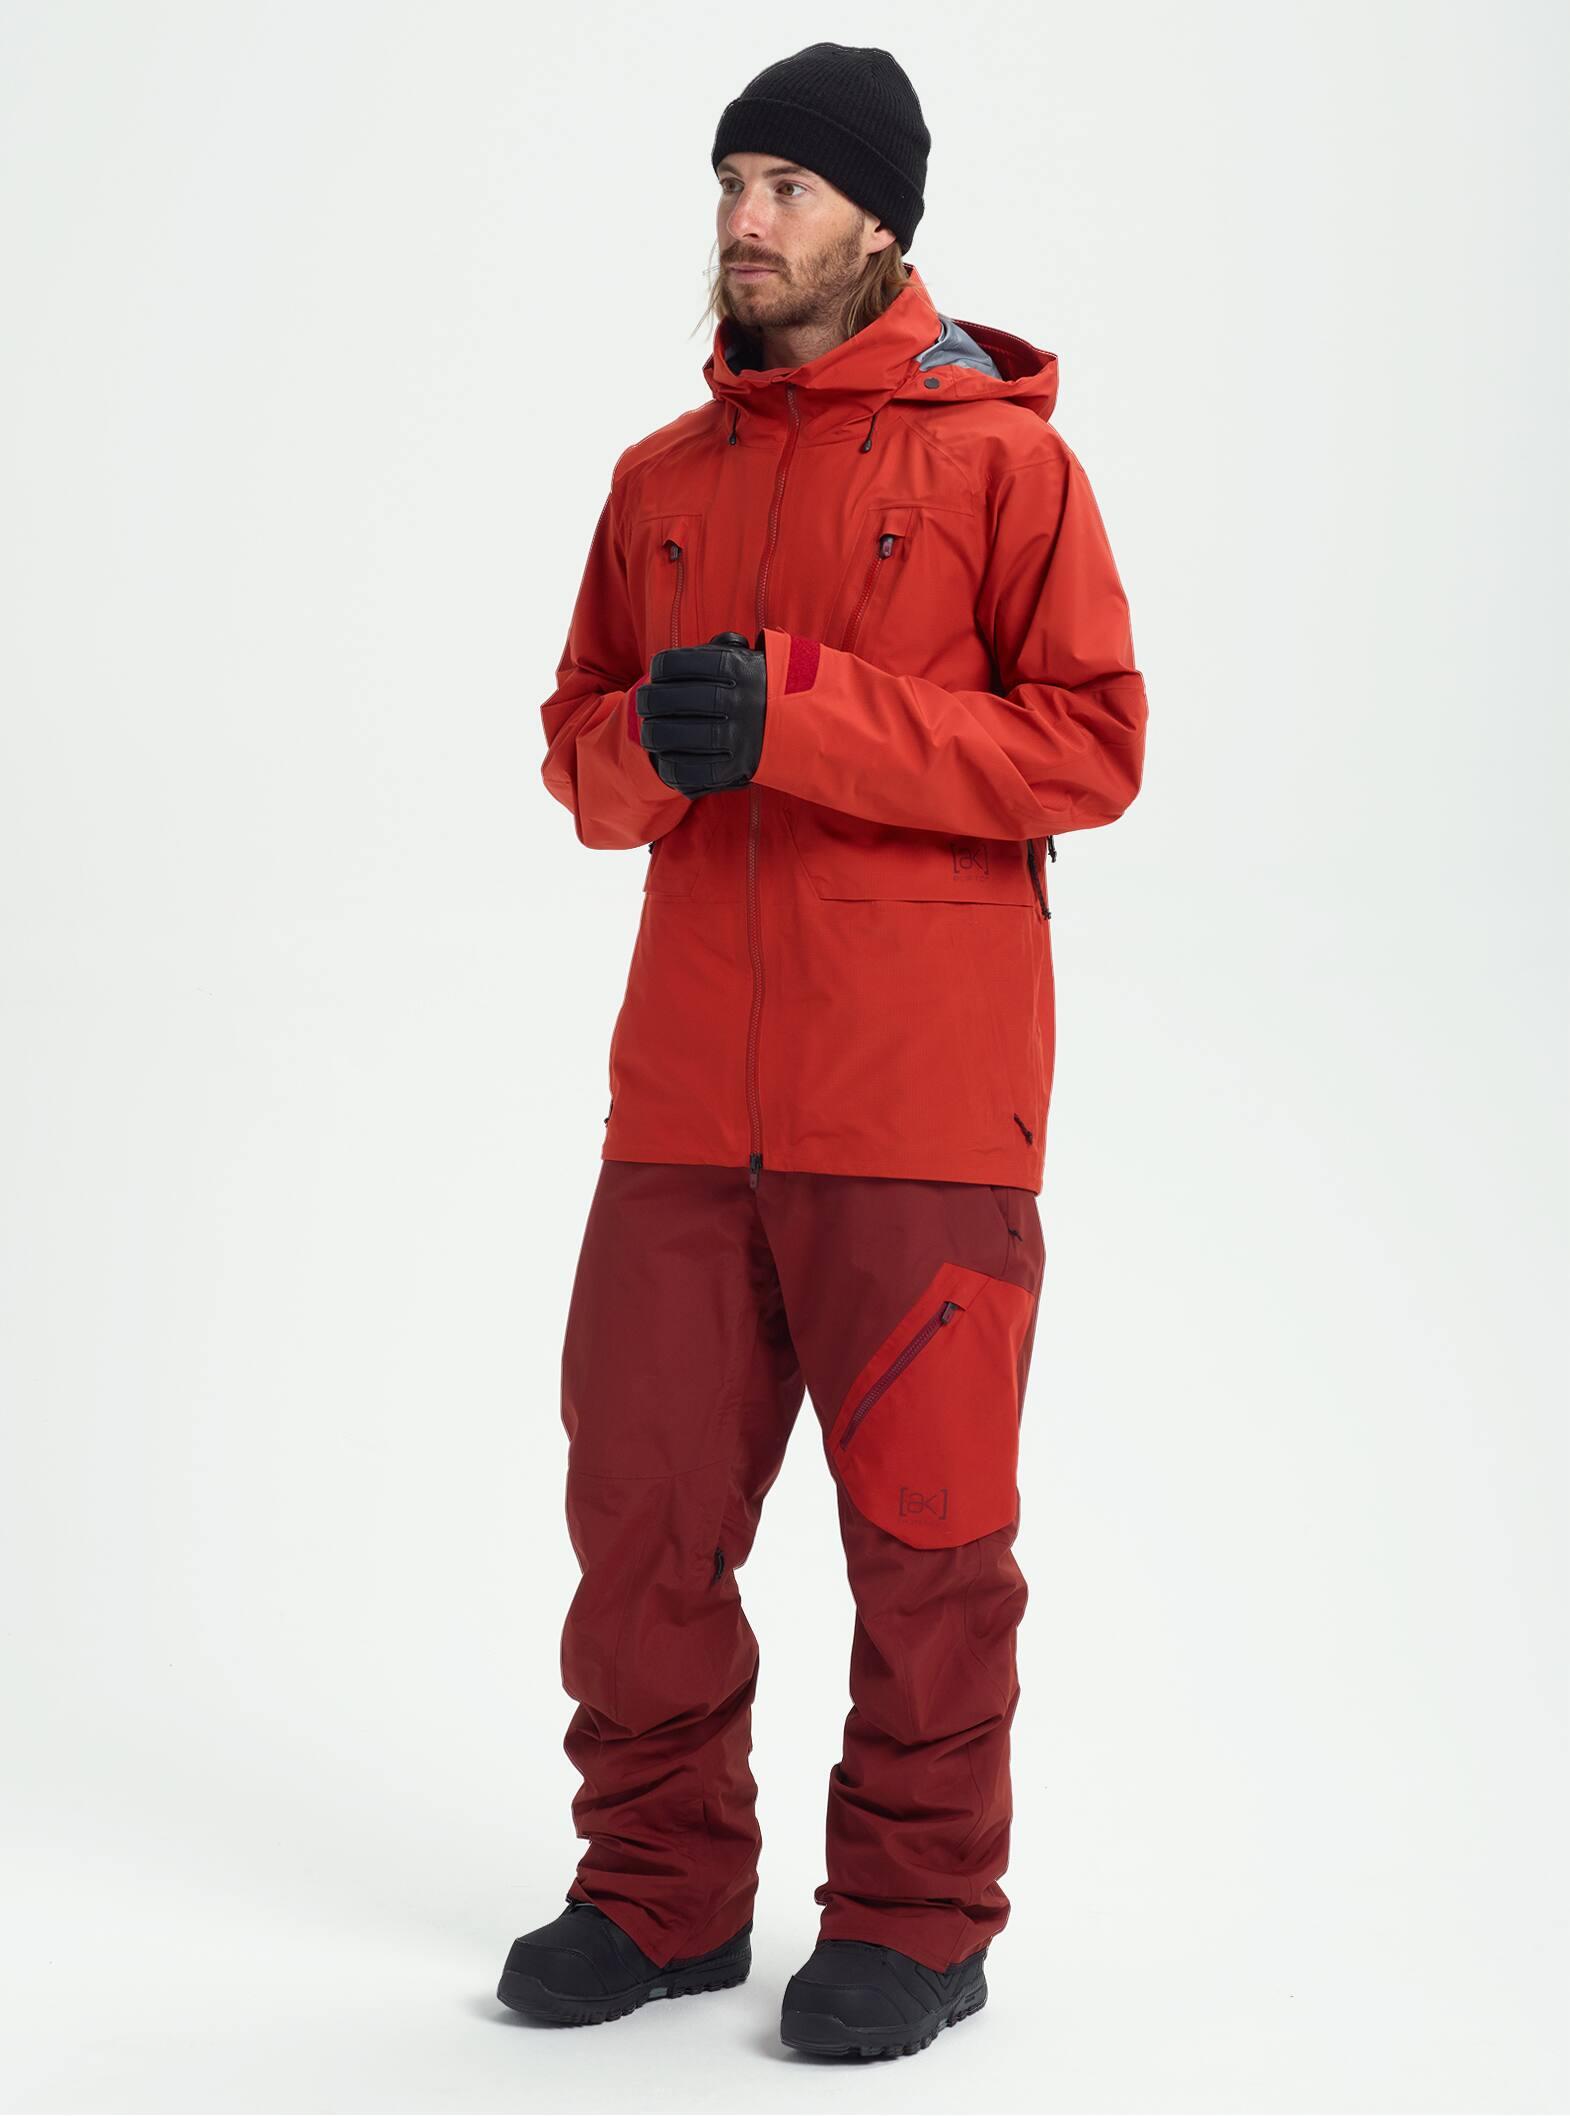 a2b440243f408 Men's Snowboard Jackets | Burton Snowboards